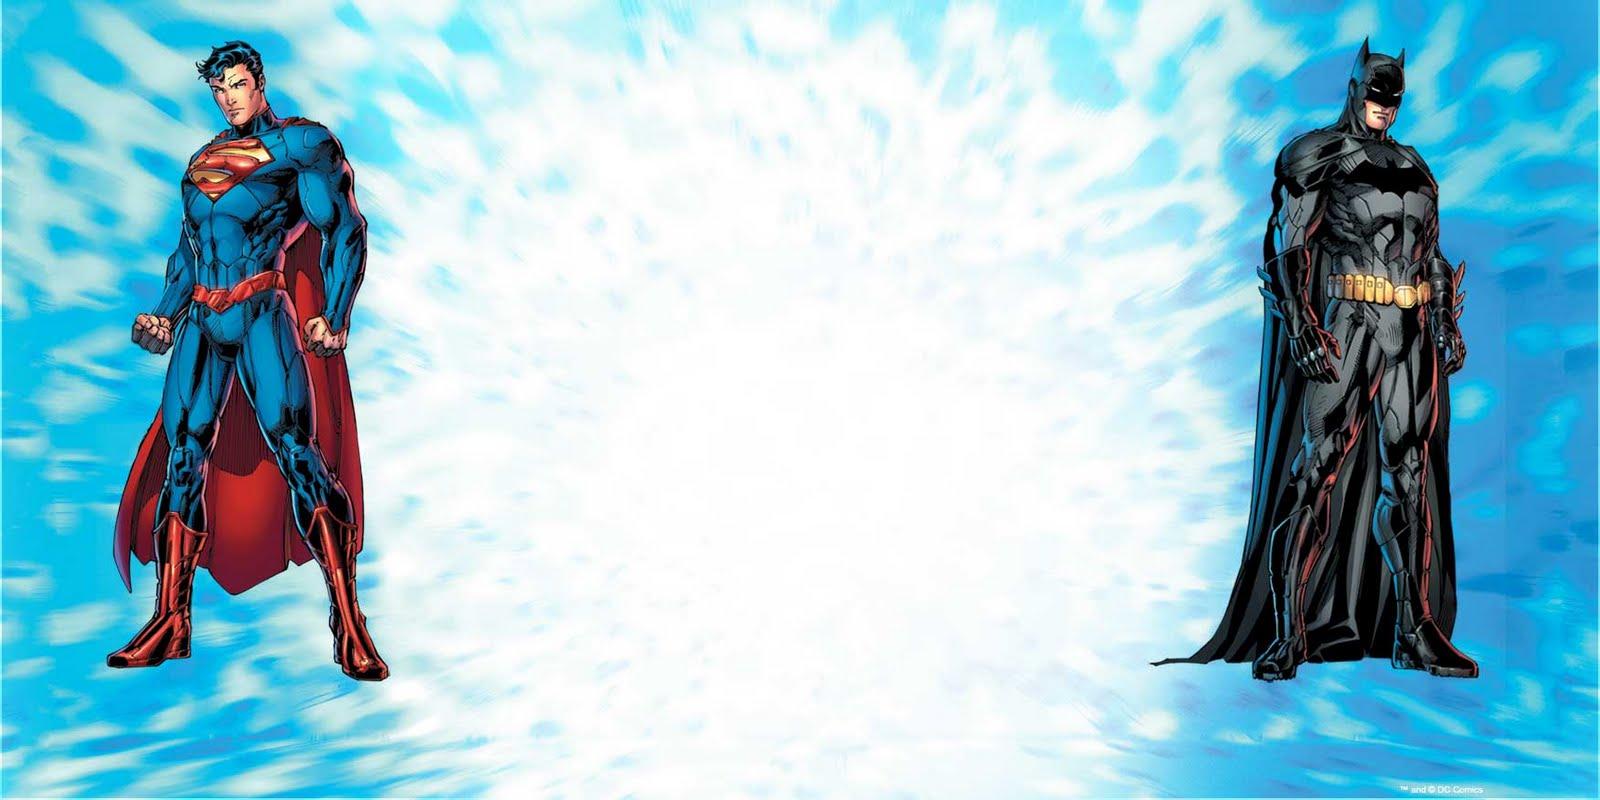 http://2.bp.blogspot.com/-stAzVCU2qxs/Tl2_s3YXpuI/AAAAAAAAFY8/jYp0-RdhXKw/s1600/DC-new52-batman-superman-wallpaper.jpg